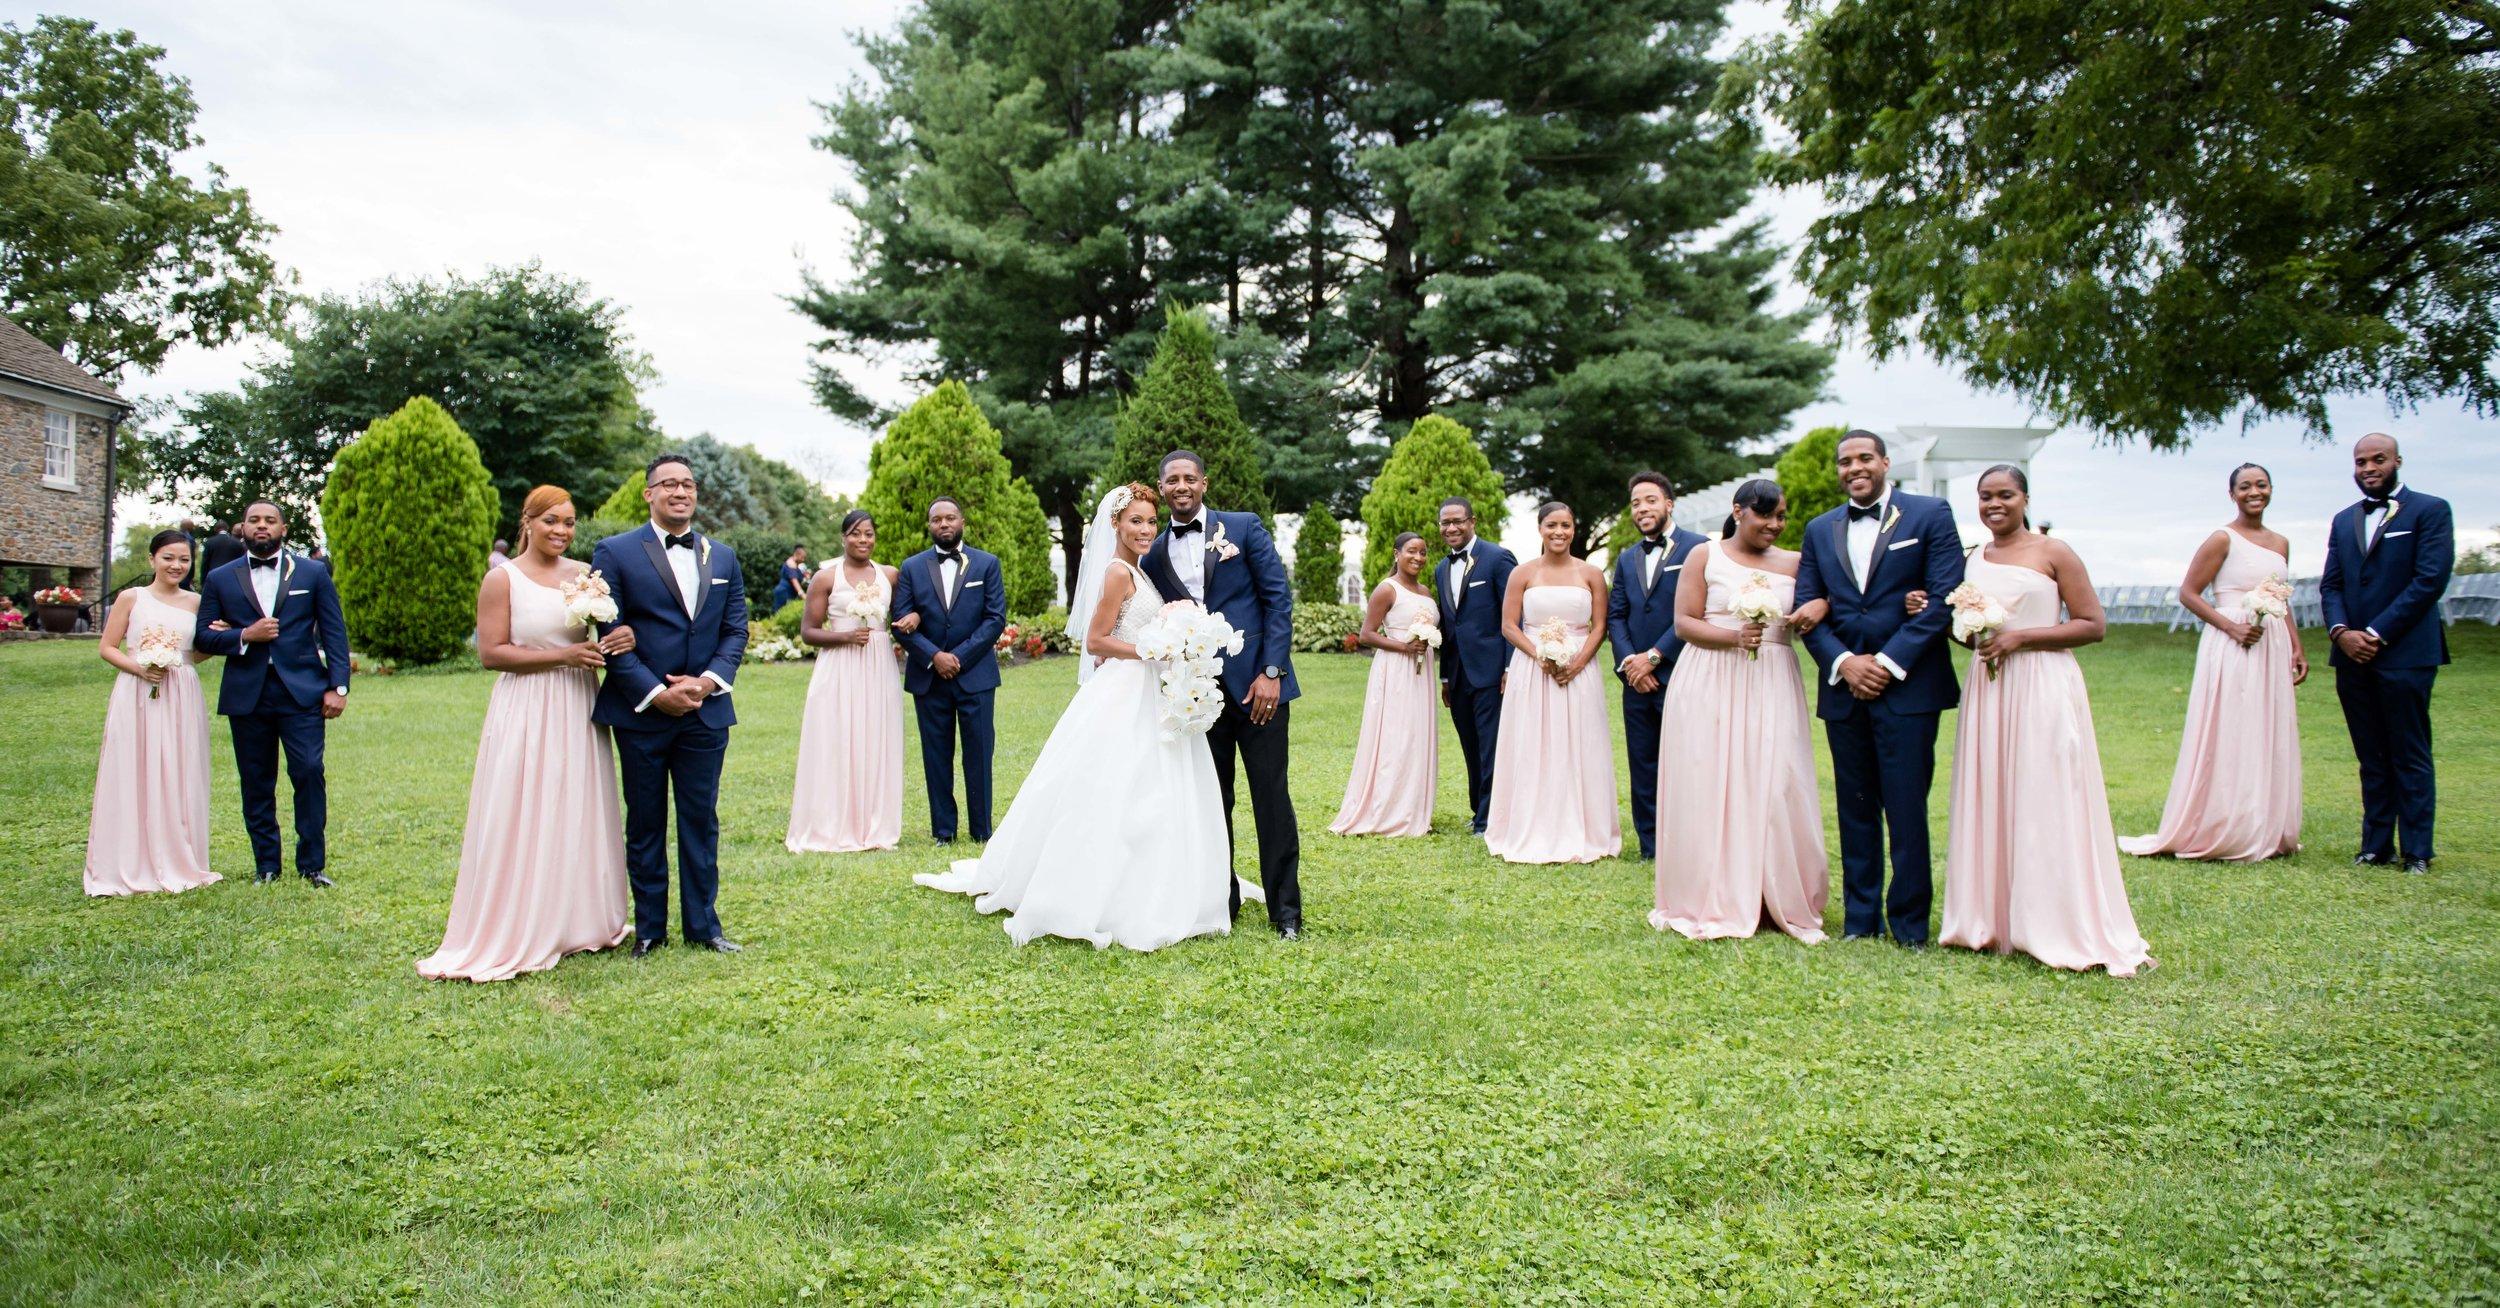 Chase Wedding - 2017-72.JPG